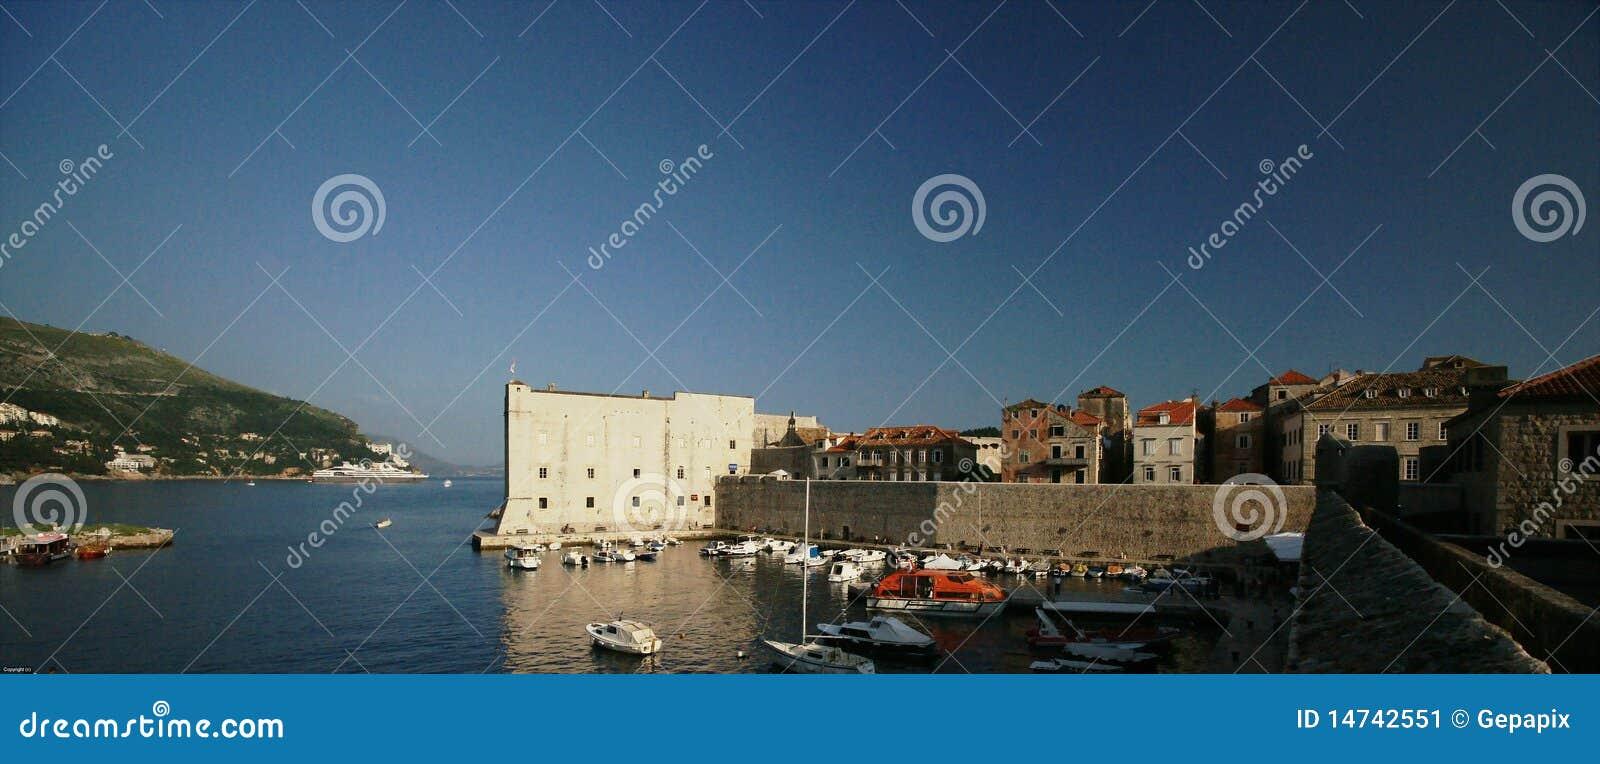 Dubrovnik-Hafen